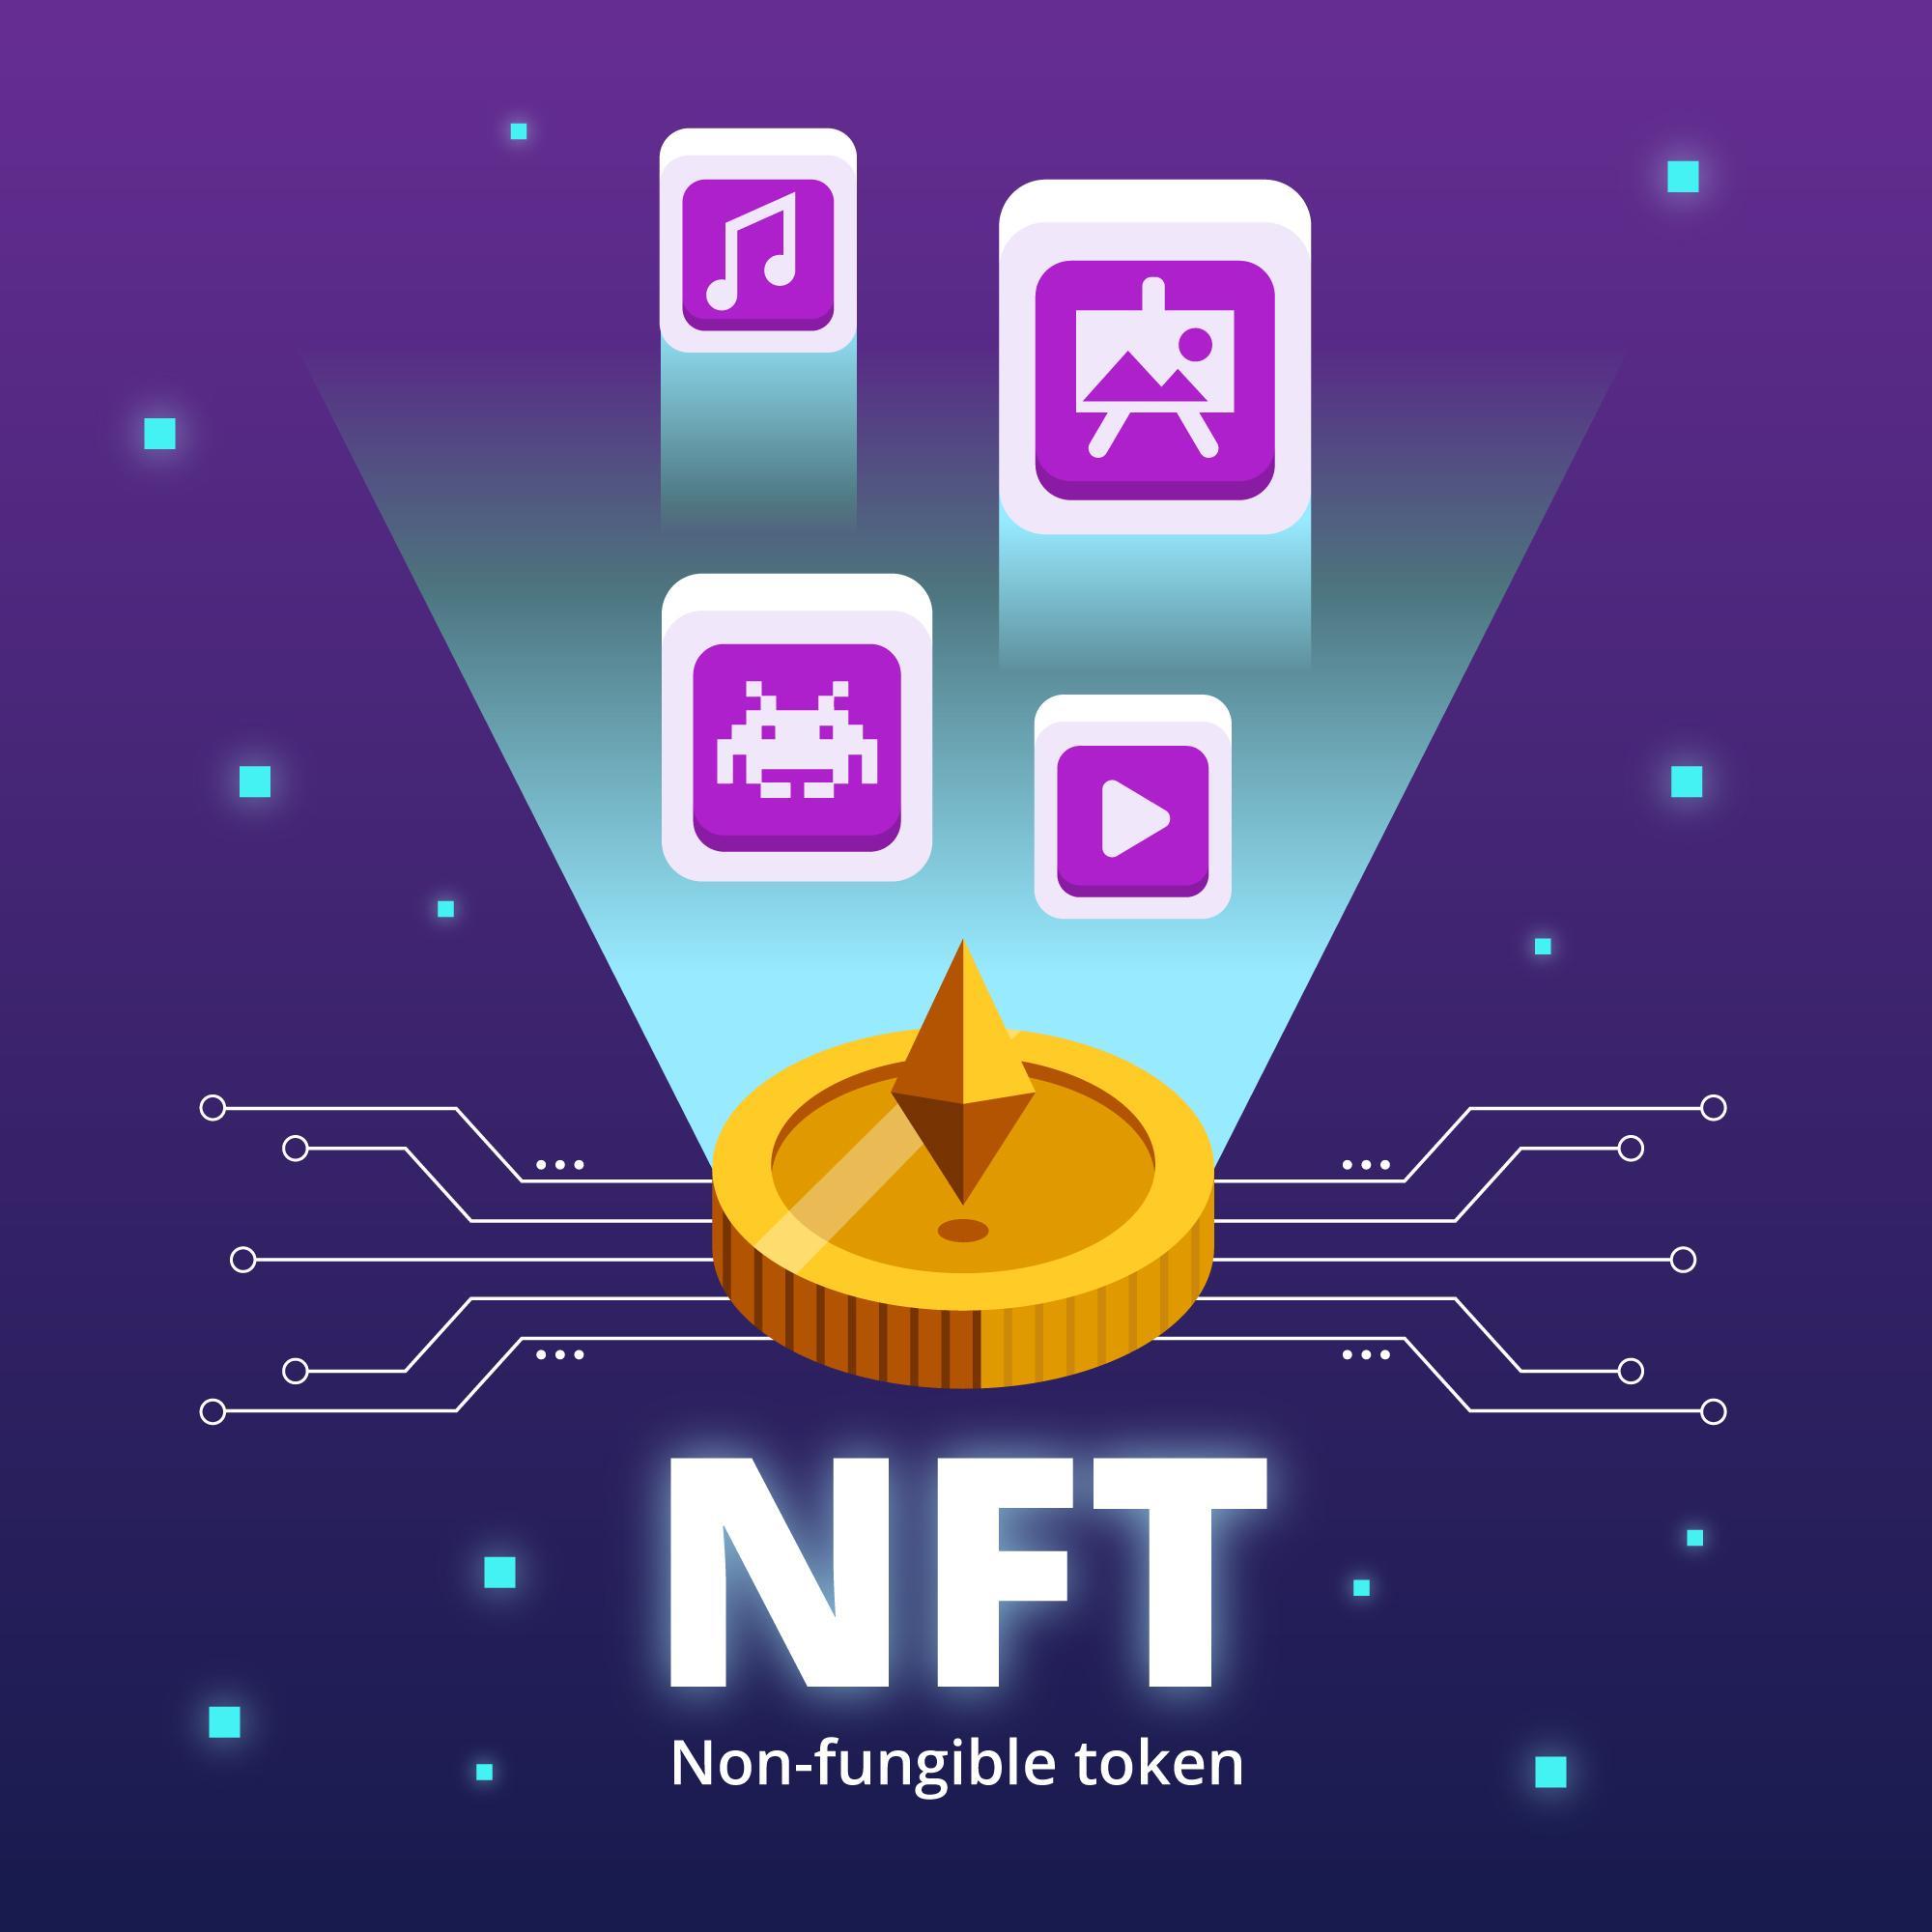 Les NFT (Non Fongible Token)